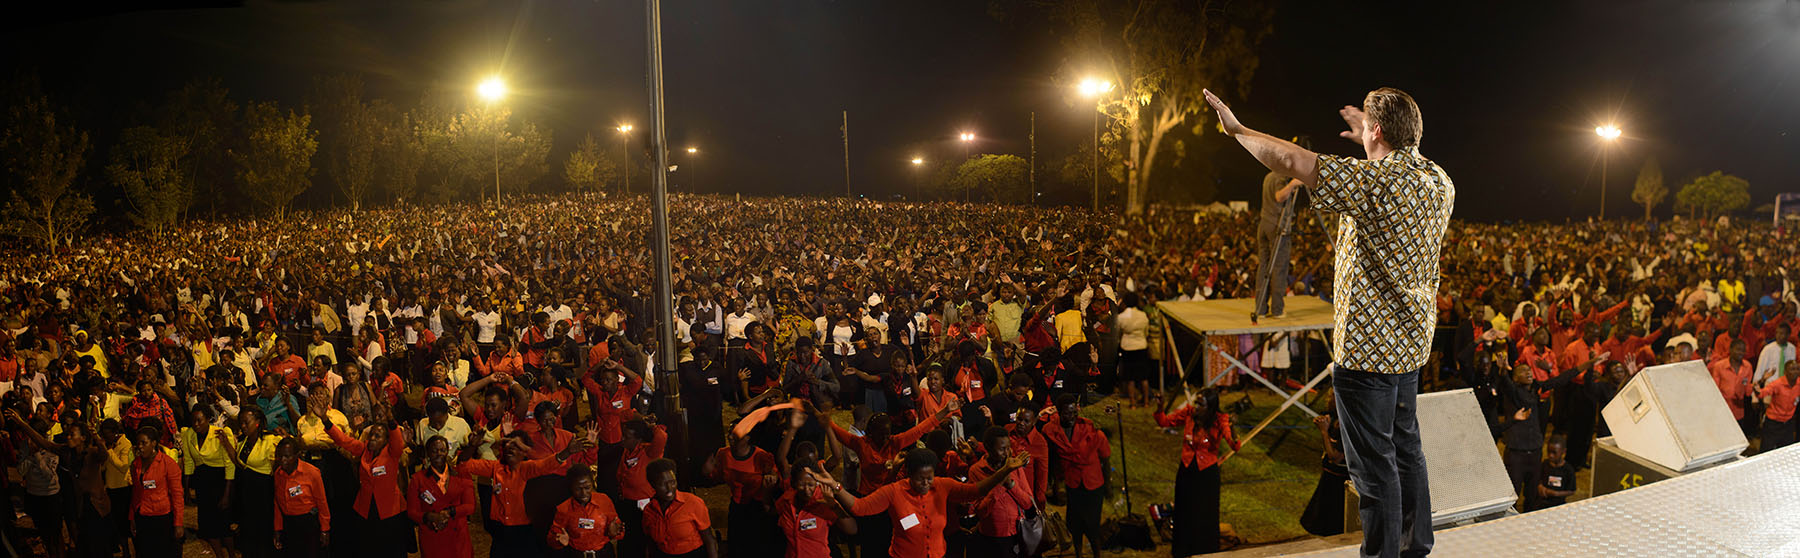 Uganda-Mbarara-2015-D4-8920 Panorama copy